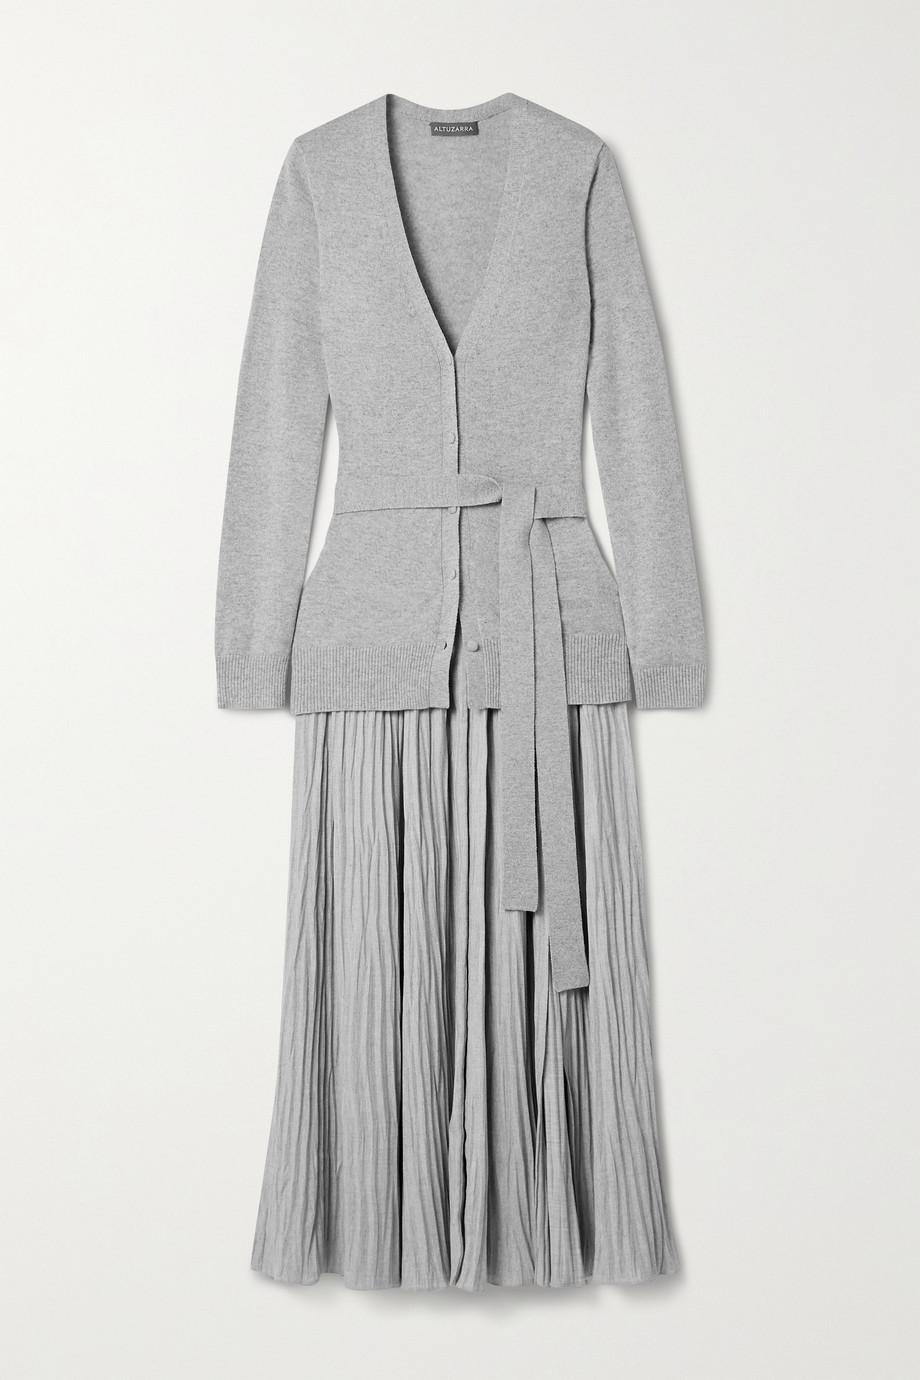 Altuzarra Manuel belted knitted midi dress